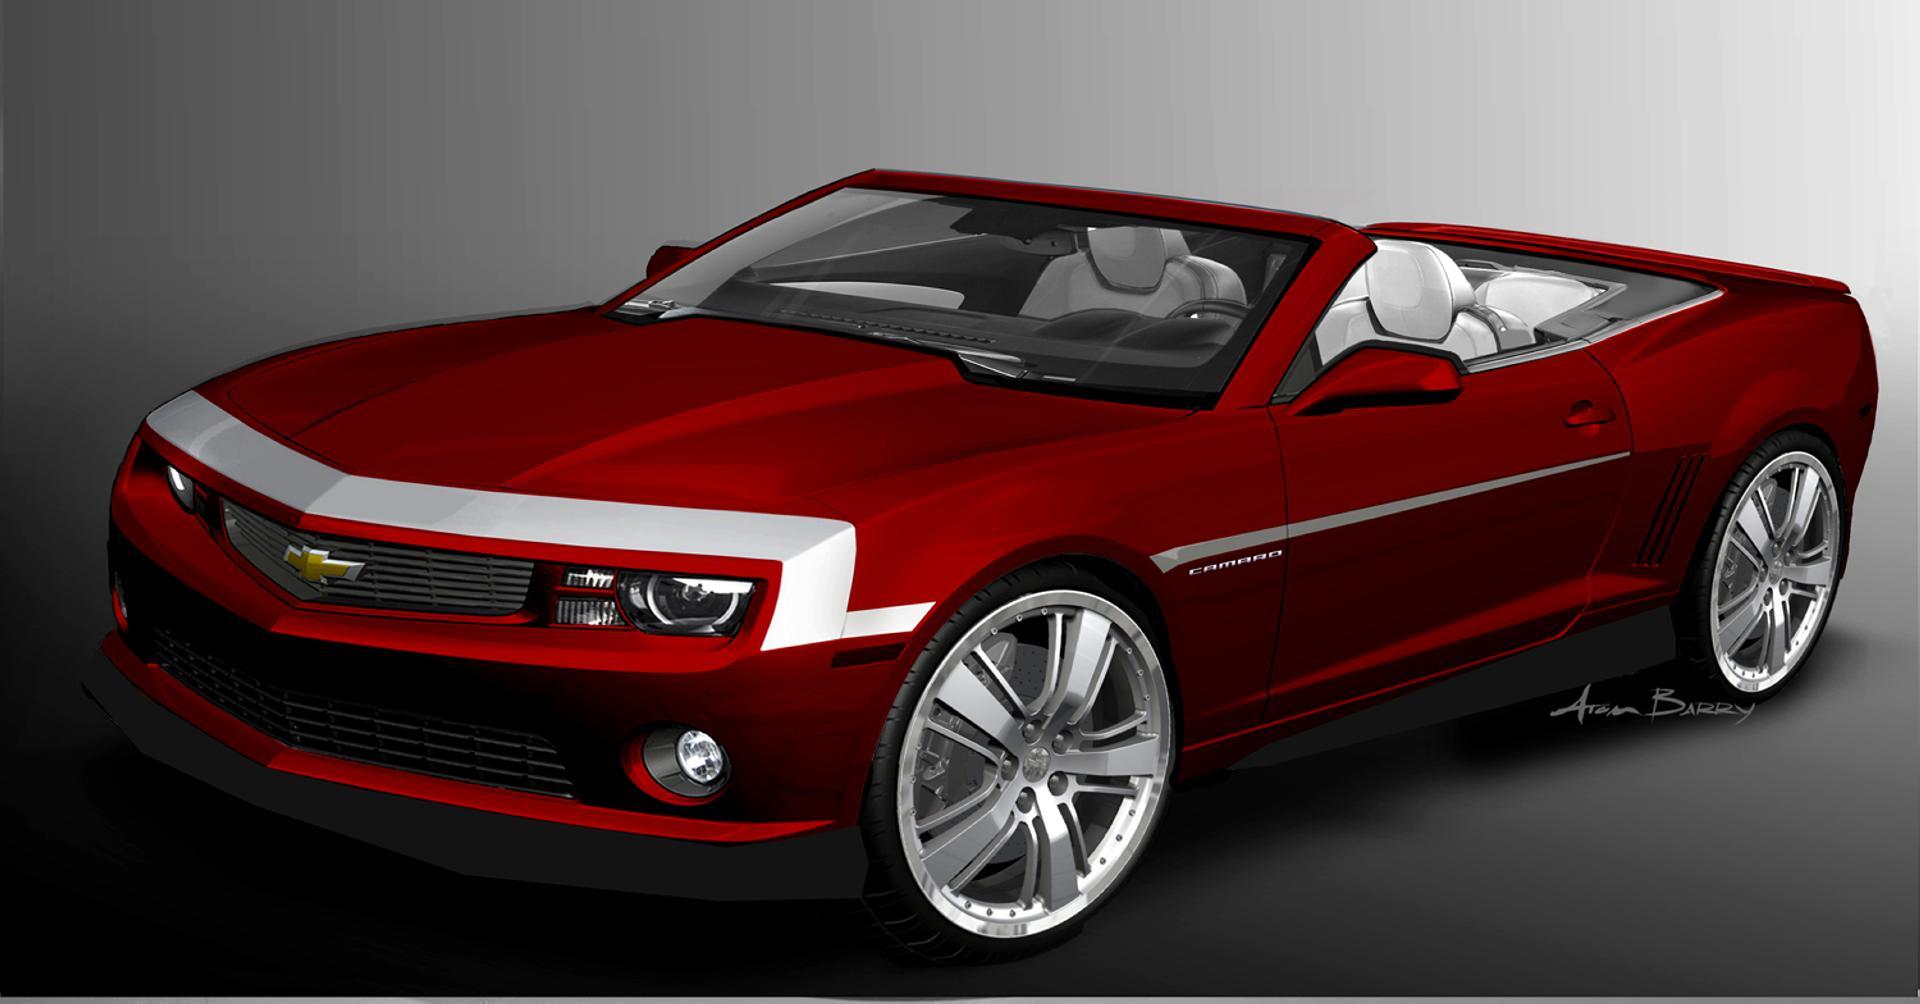 2012 Chevrolet Camaro Red Zone Concept Image Photo 1 Of 3